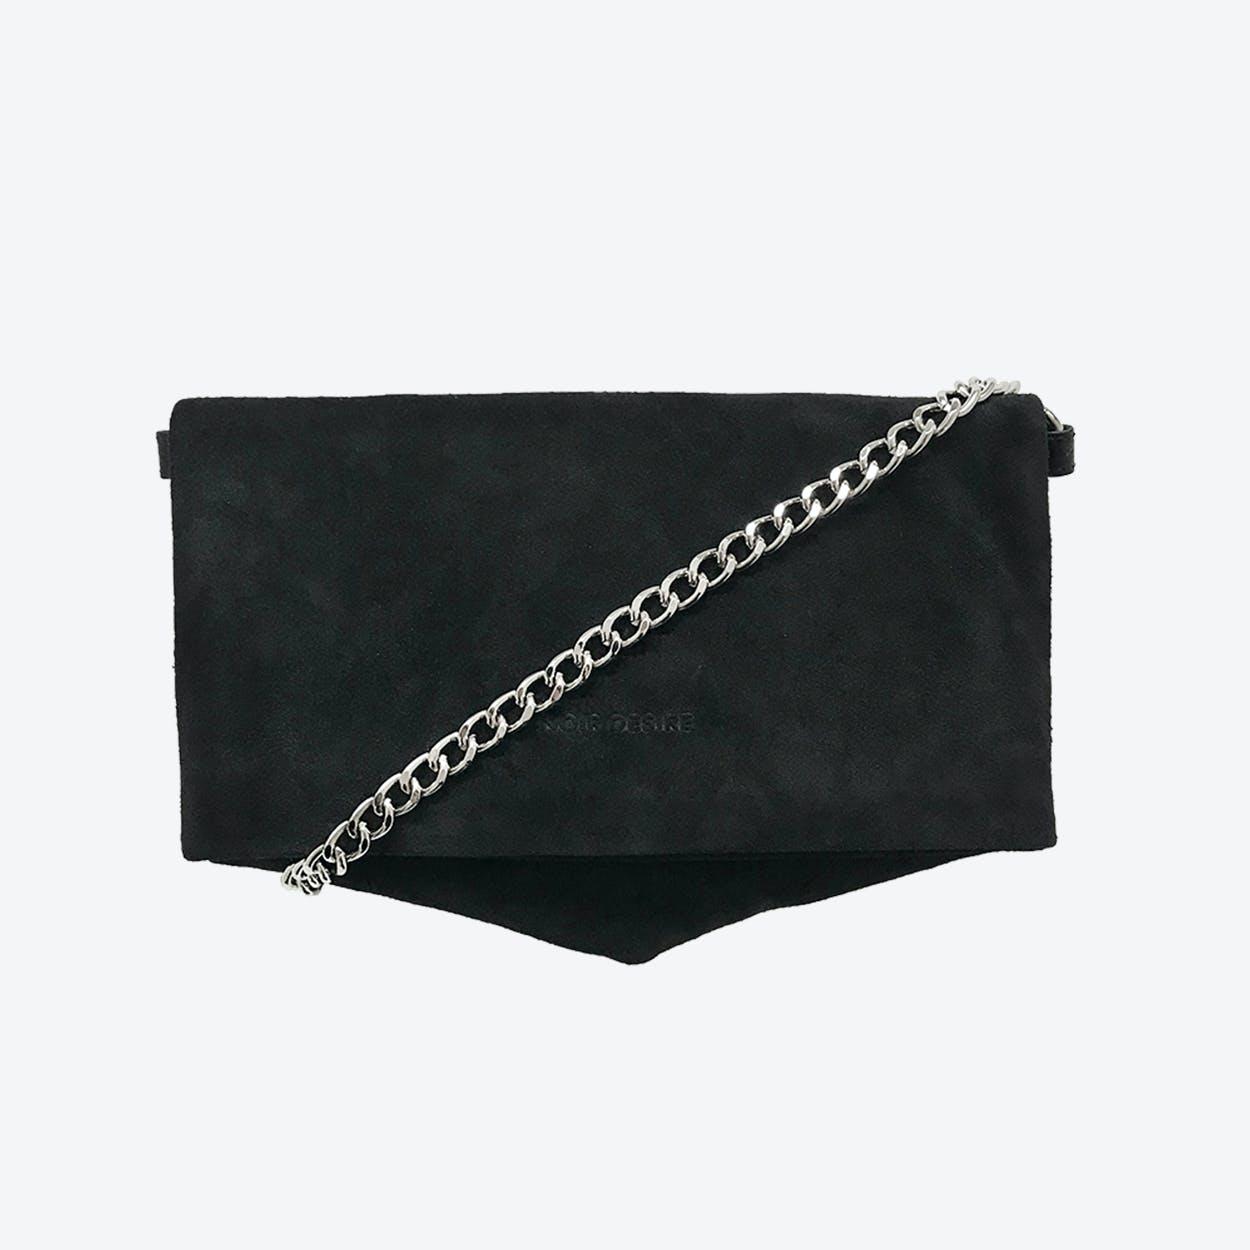 ND Folded Bag #9 - 3-in-1 Suede Bag